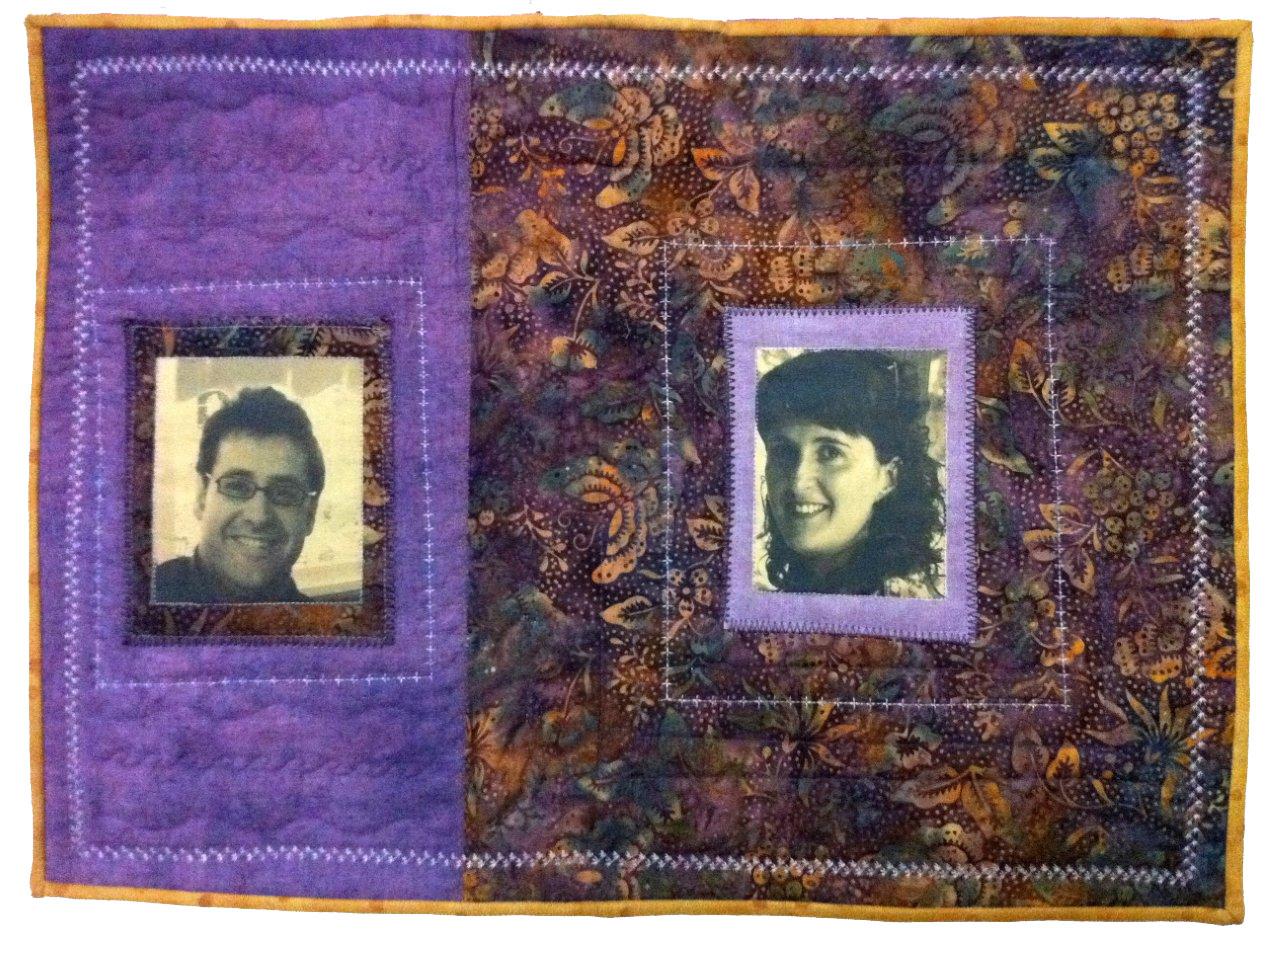 Quilt retrato de batik con fotos impresas sobre tela